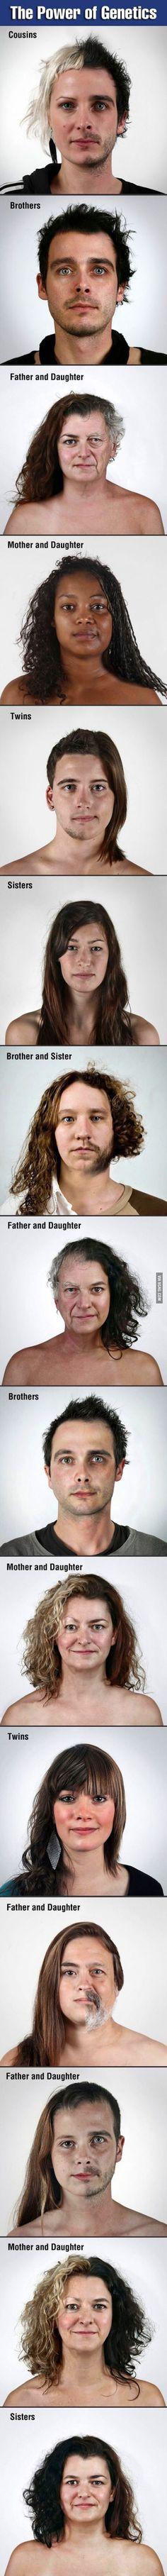 The do look alike a little